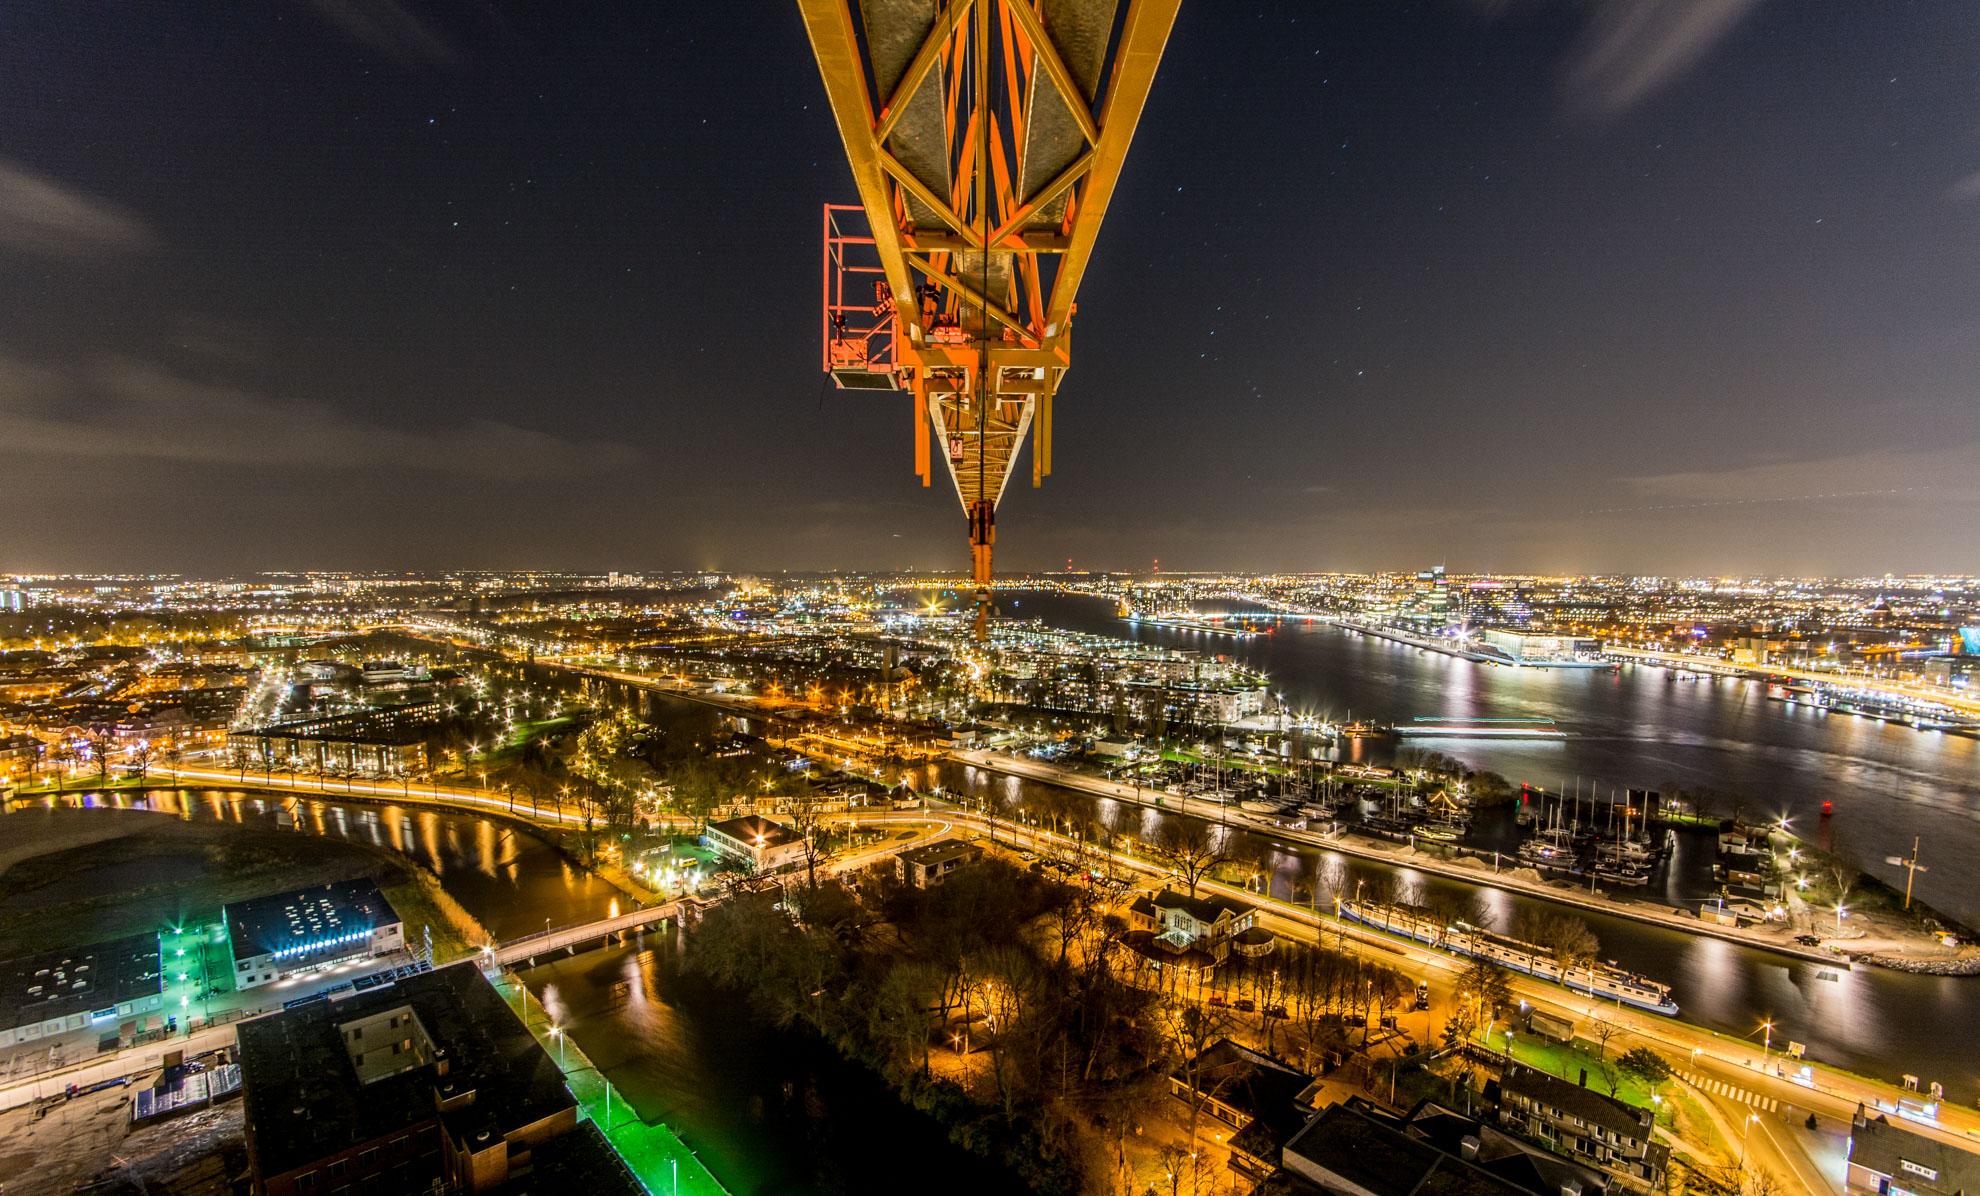 Nachtelijk Amsterdam, Kerstavond 2014, A'DAM Toren